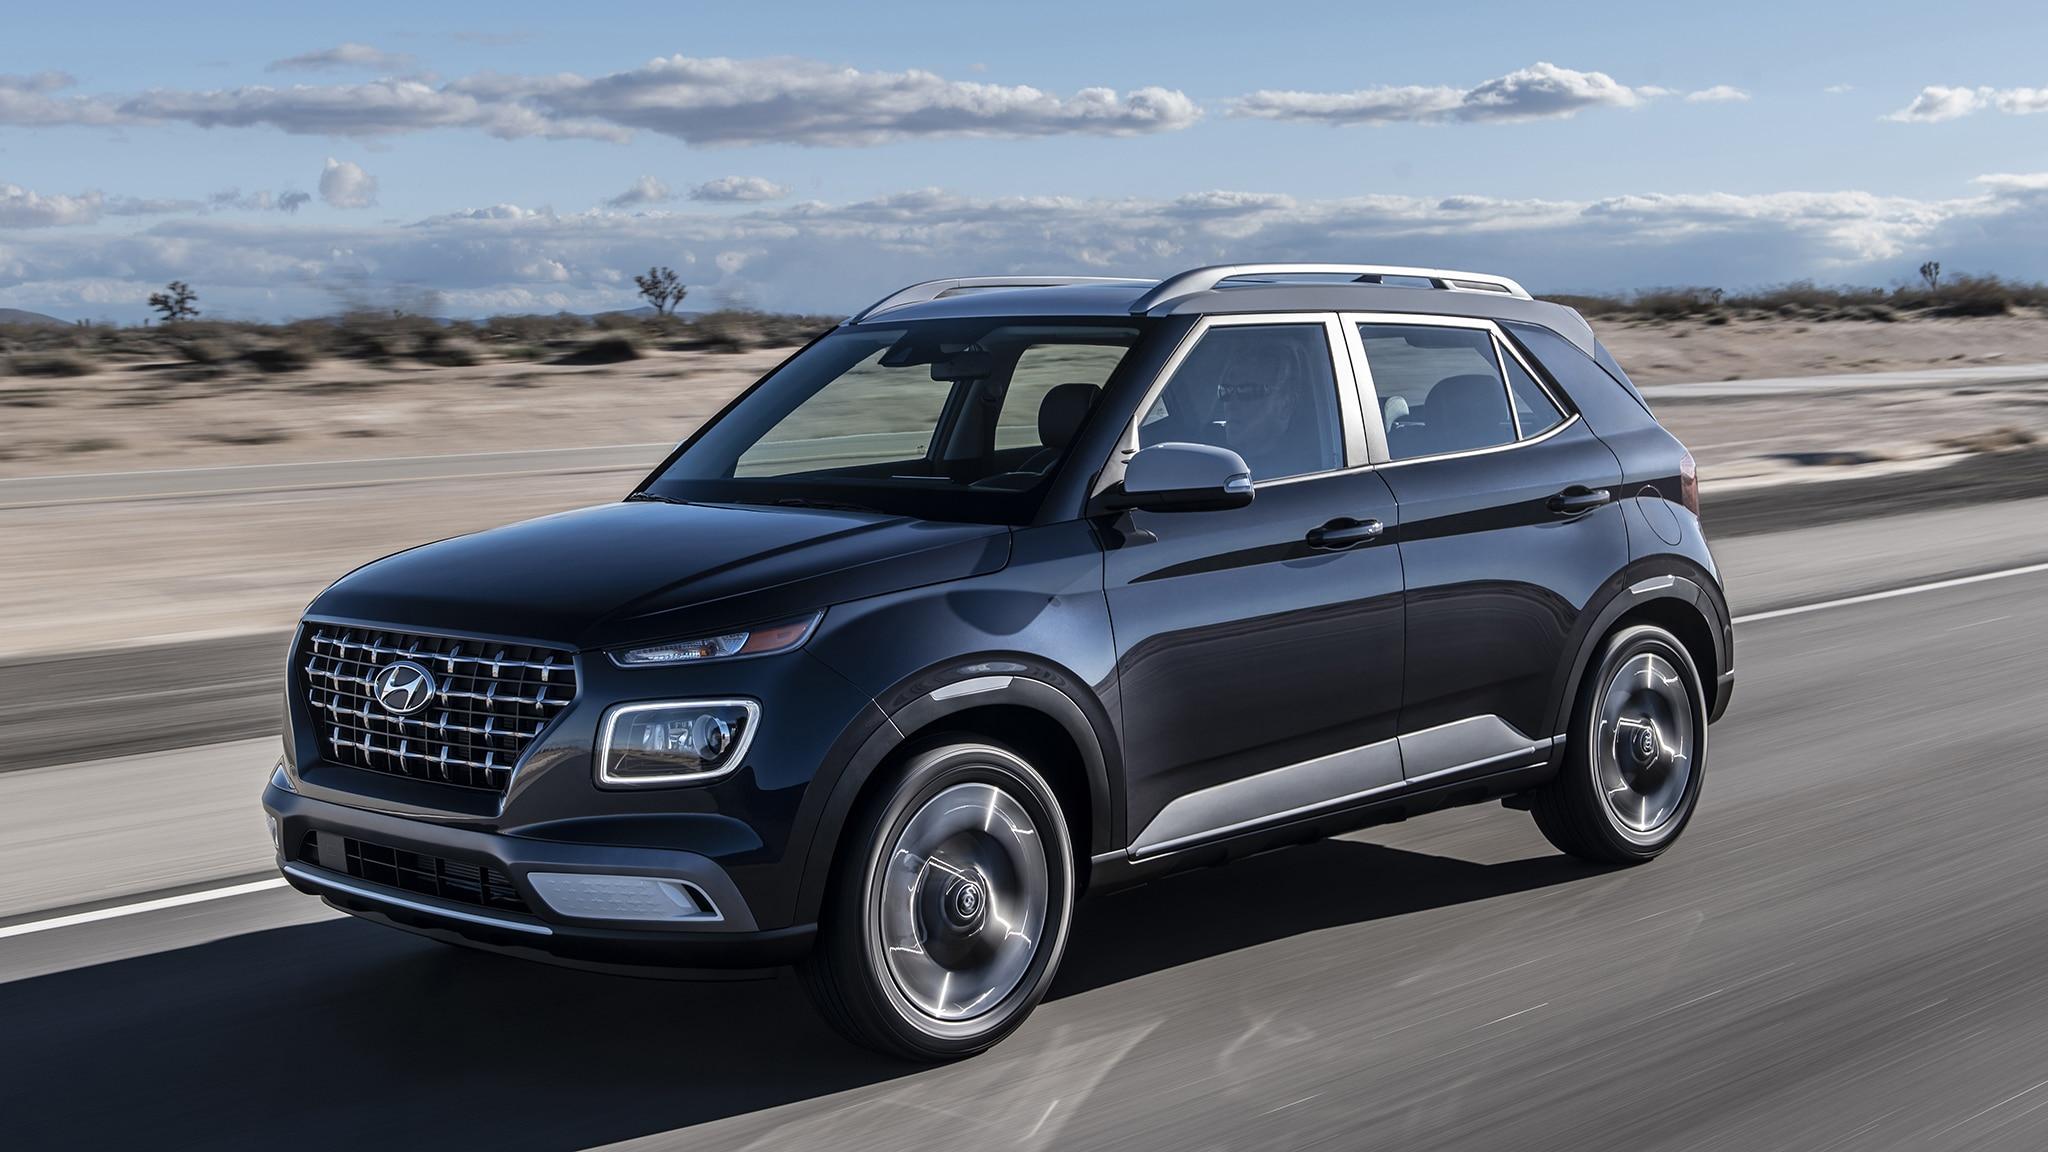 2020 Hyundai Venue First Drive Review: The Cheap New SUV ...